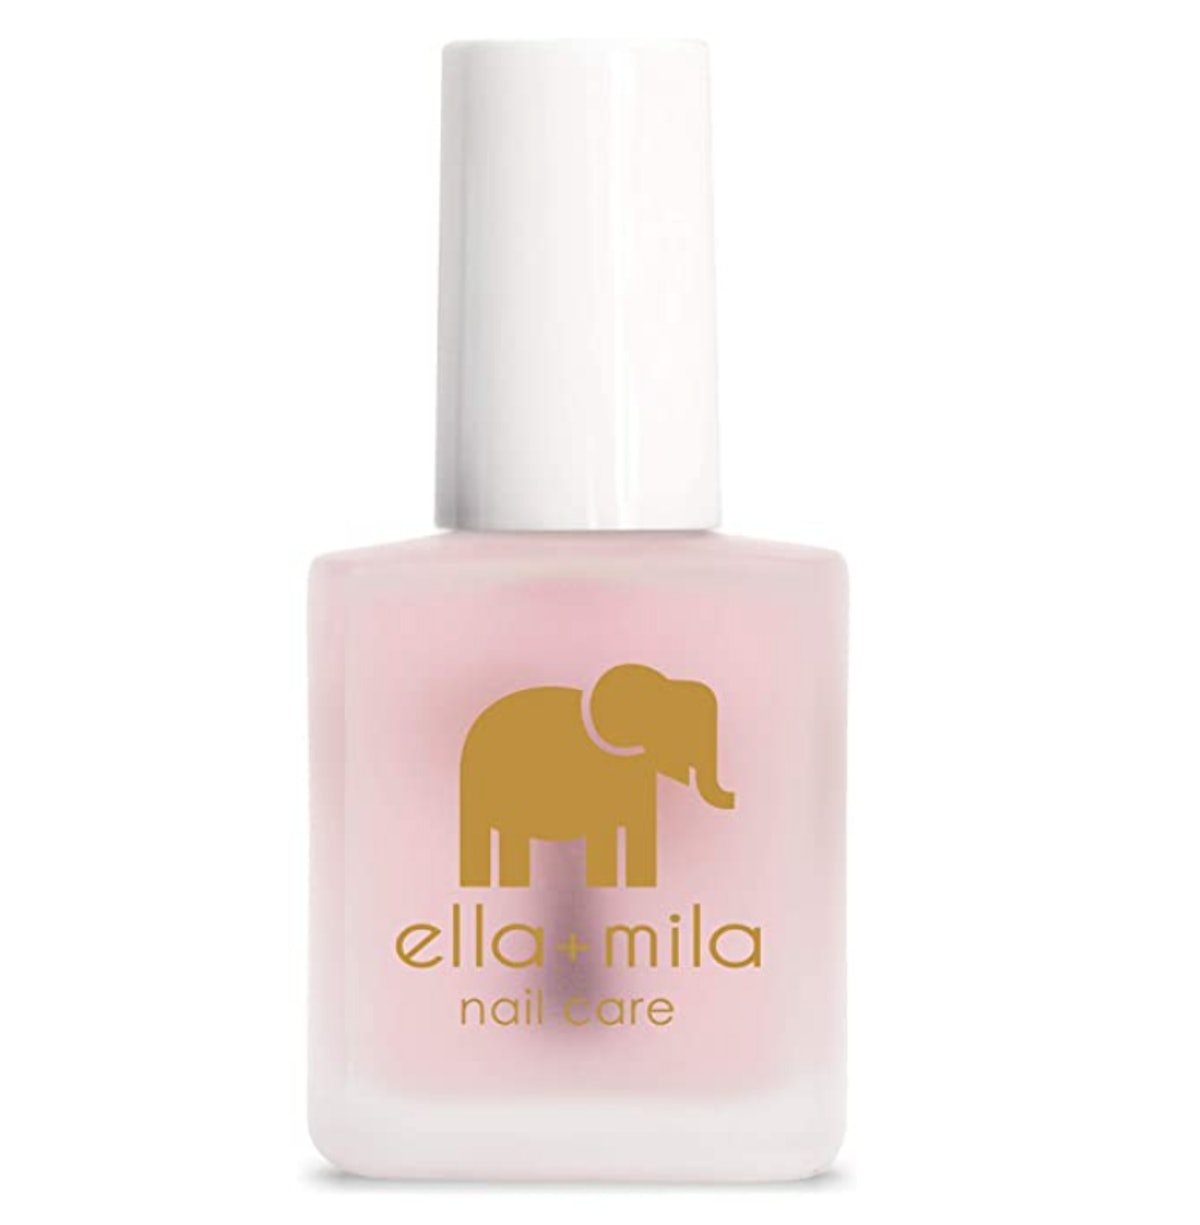 ella+mila First Aid Kiss Nail Strengthener & Growth Treatment